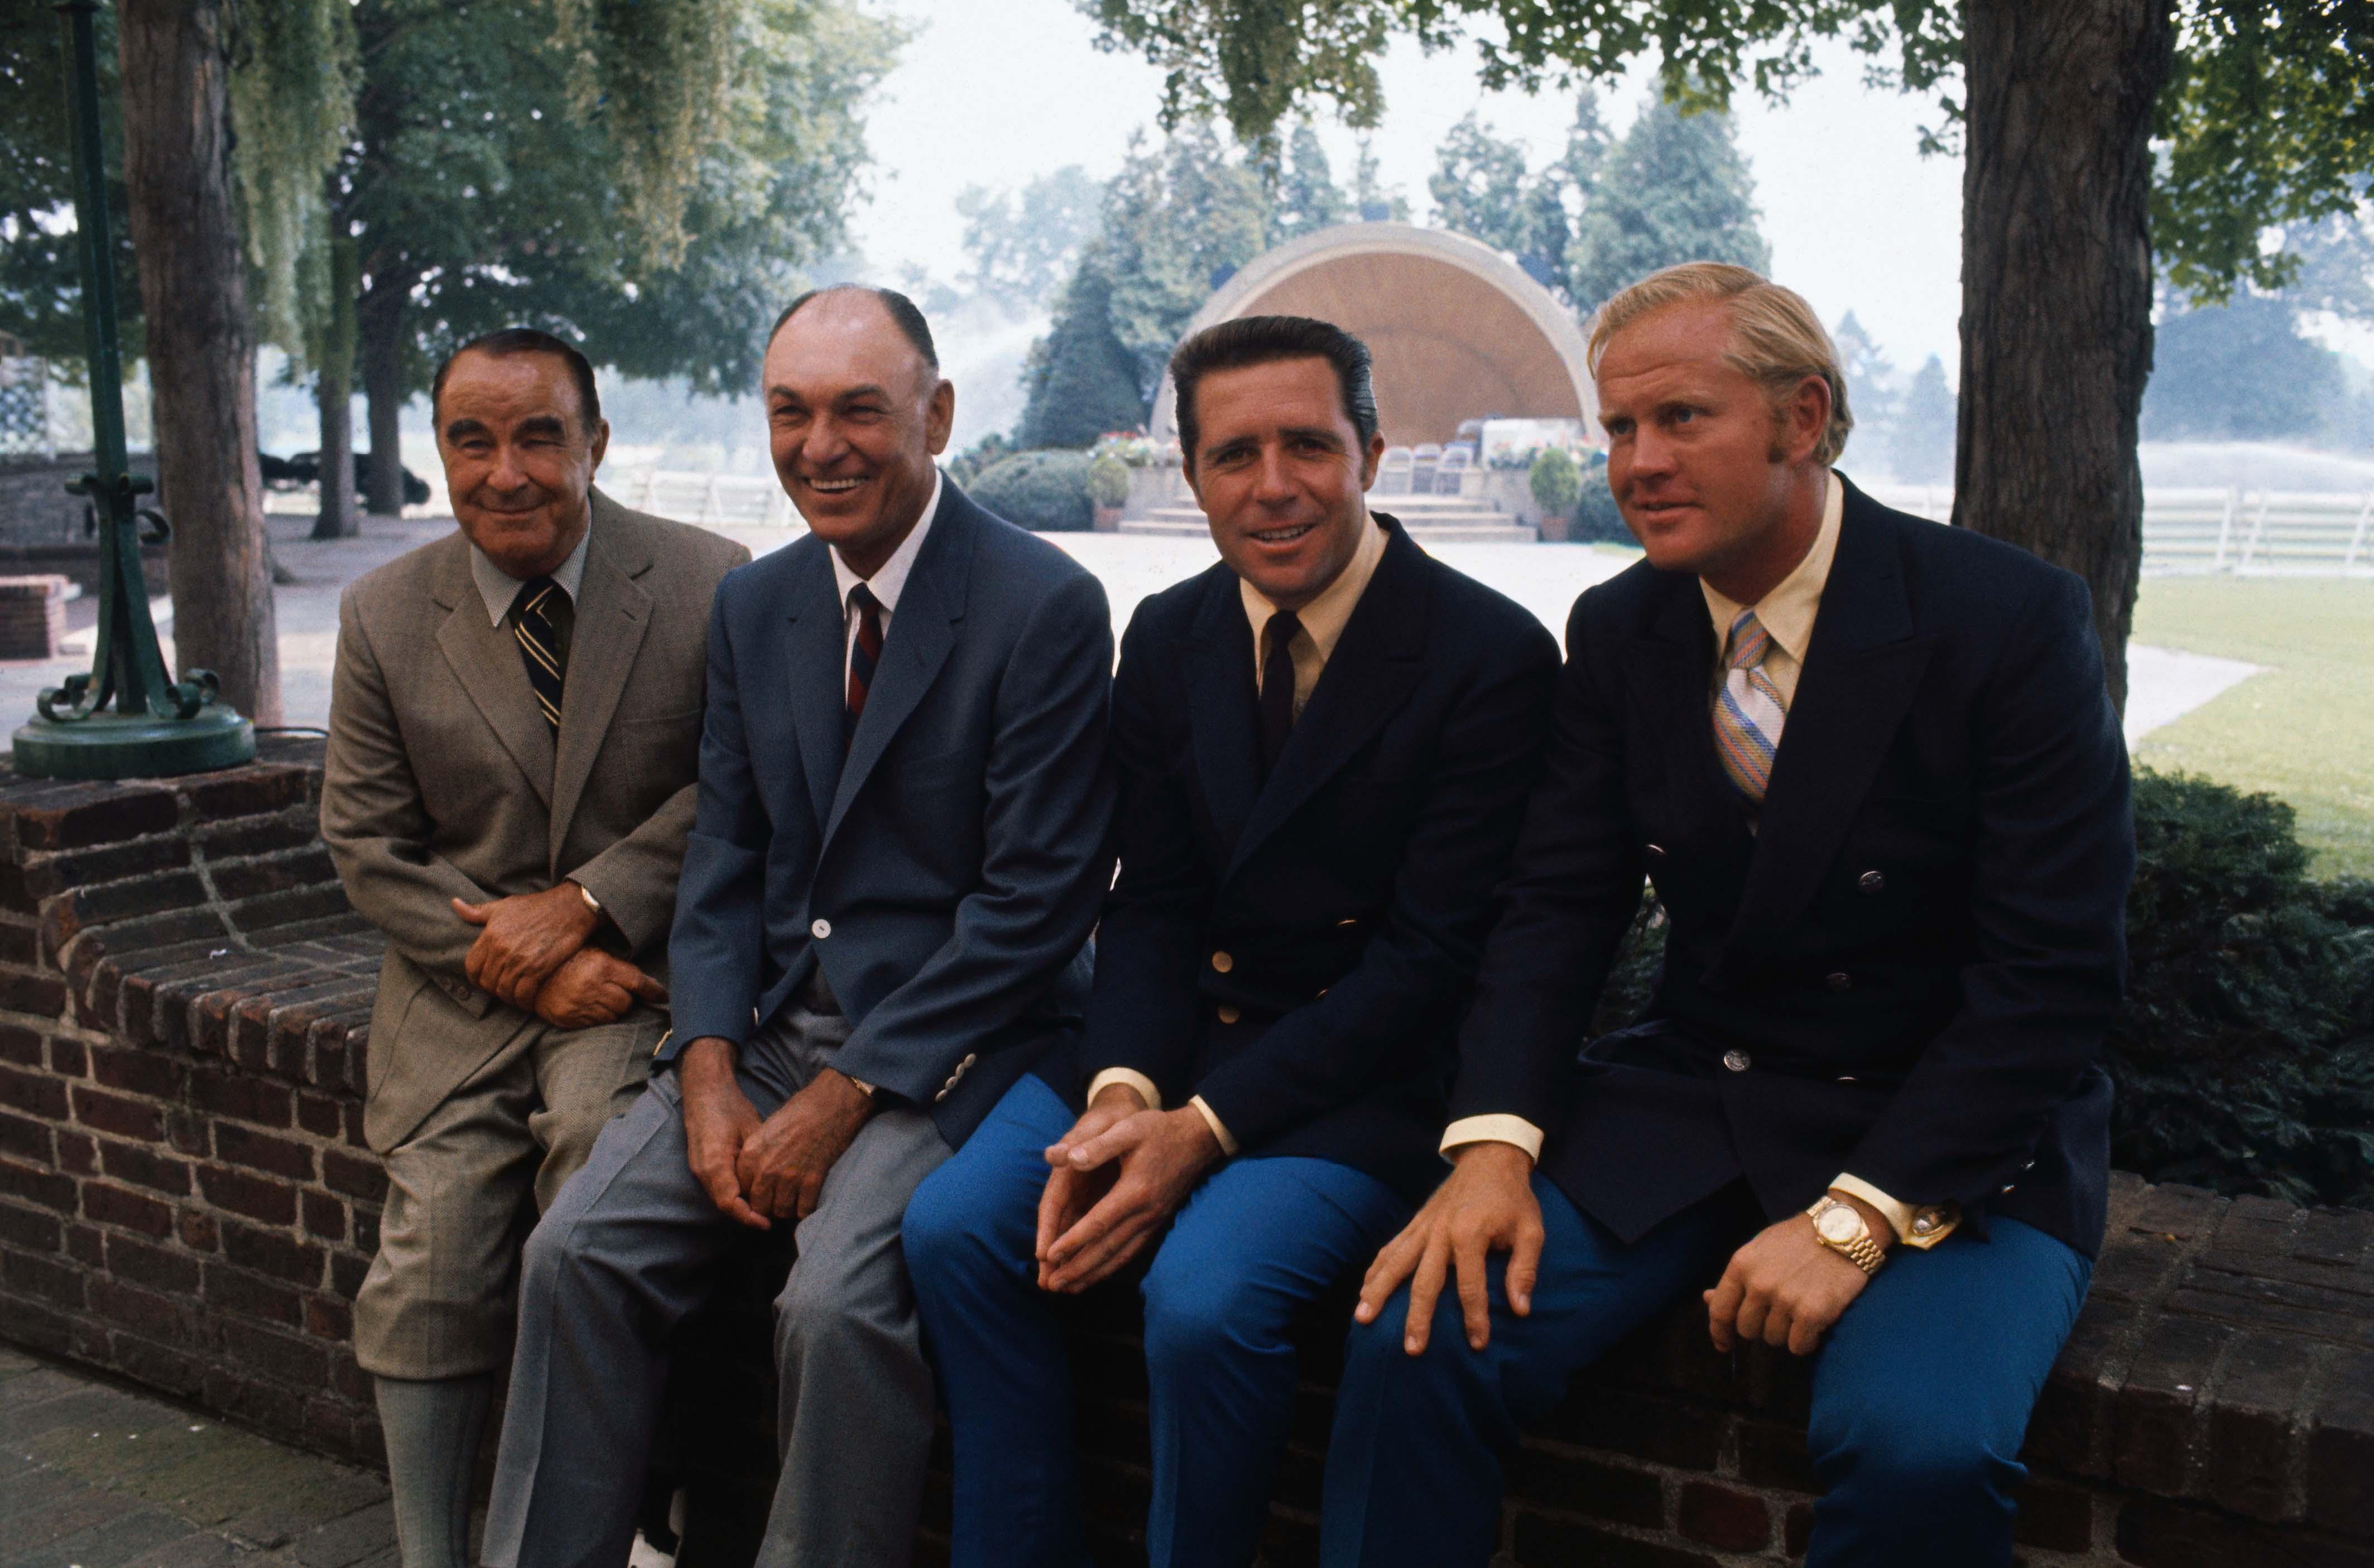 Career Grand Slam winners, Westchester, 1970